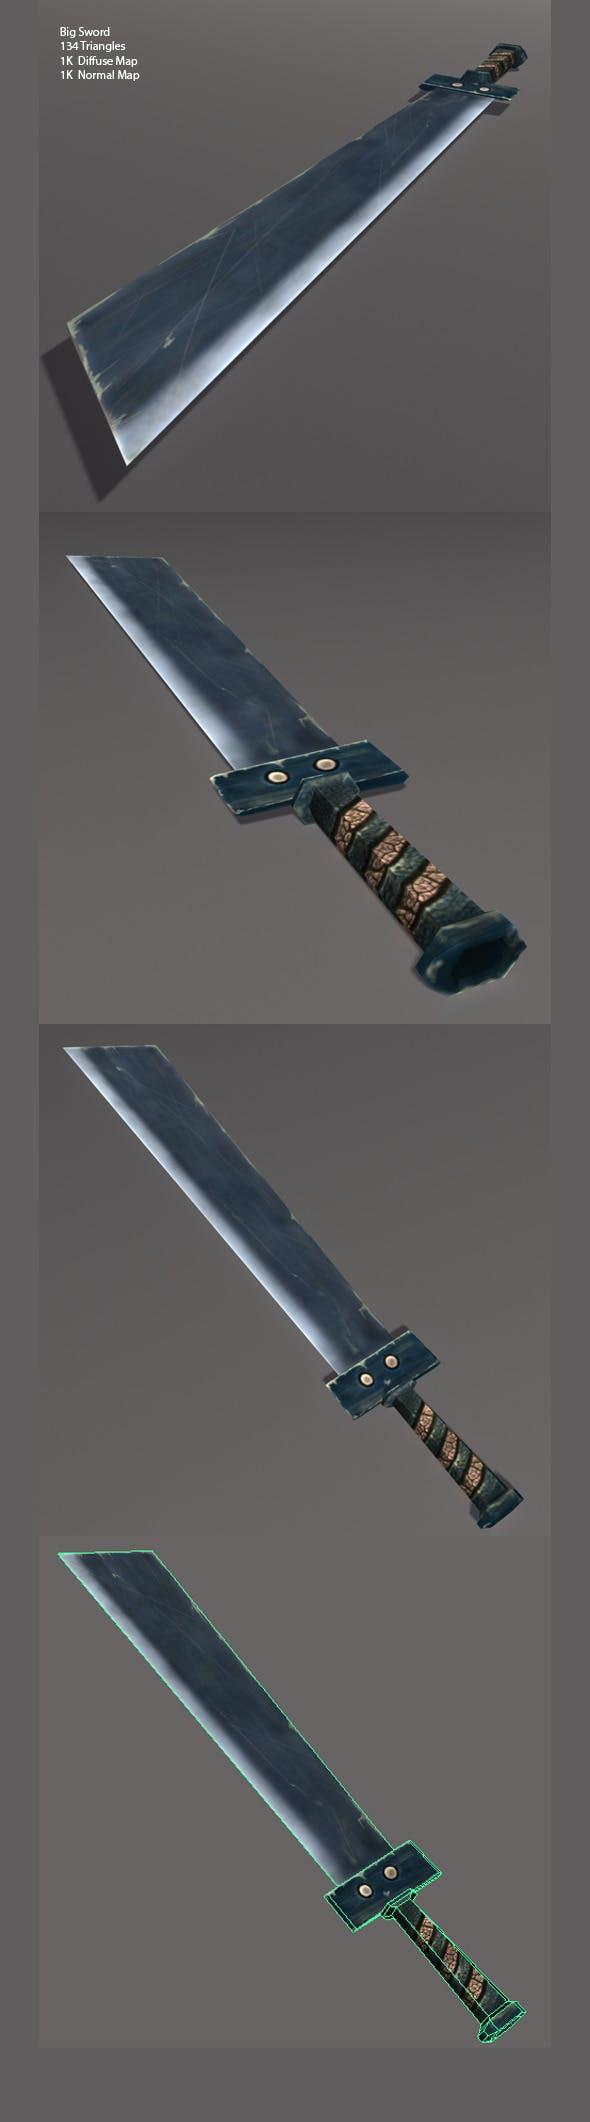 Low Poly Big Sword - 3DOcean Item for Sale